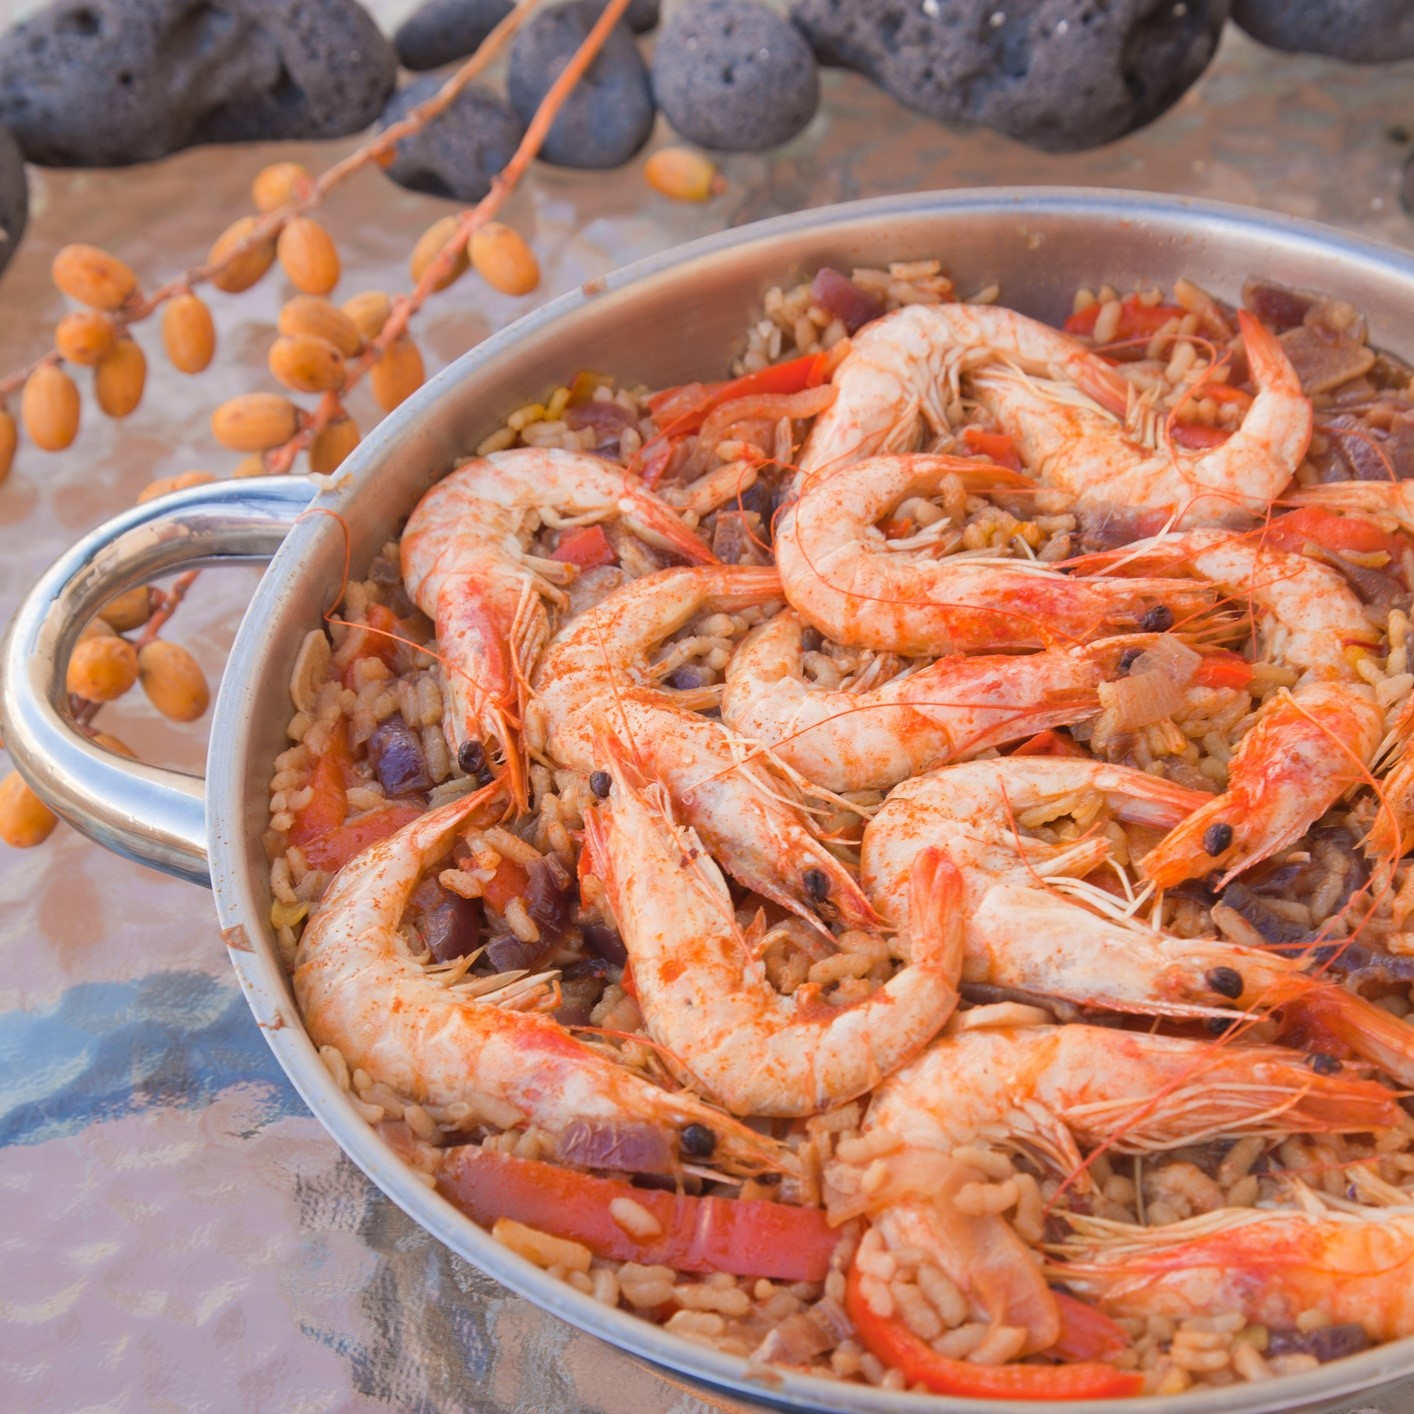 Seafood paella - culinary arts